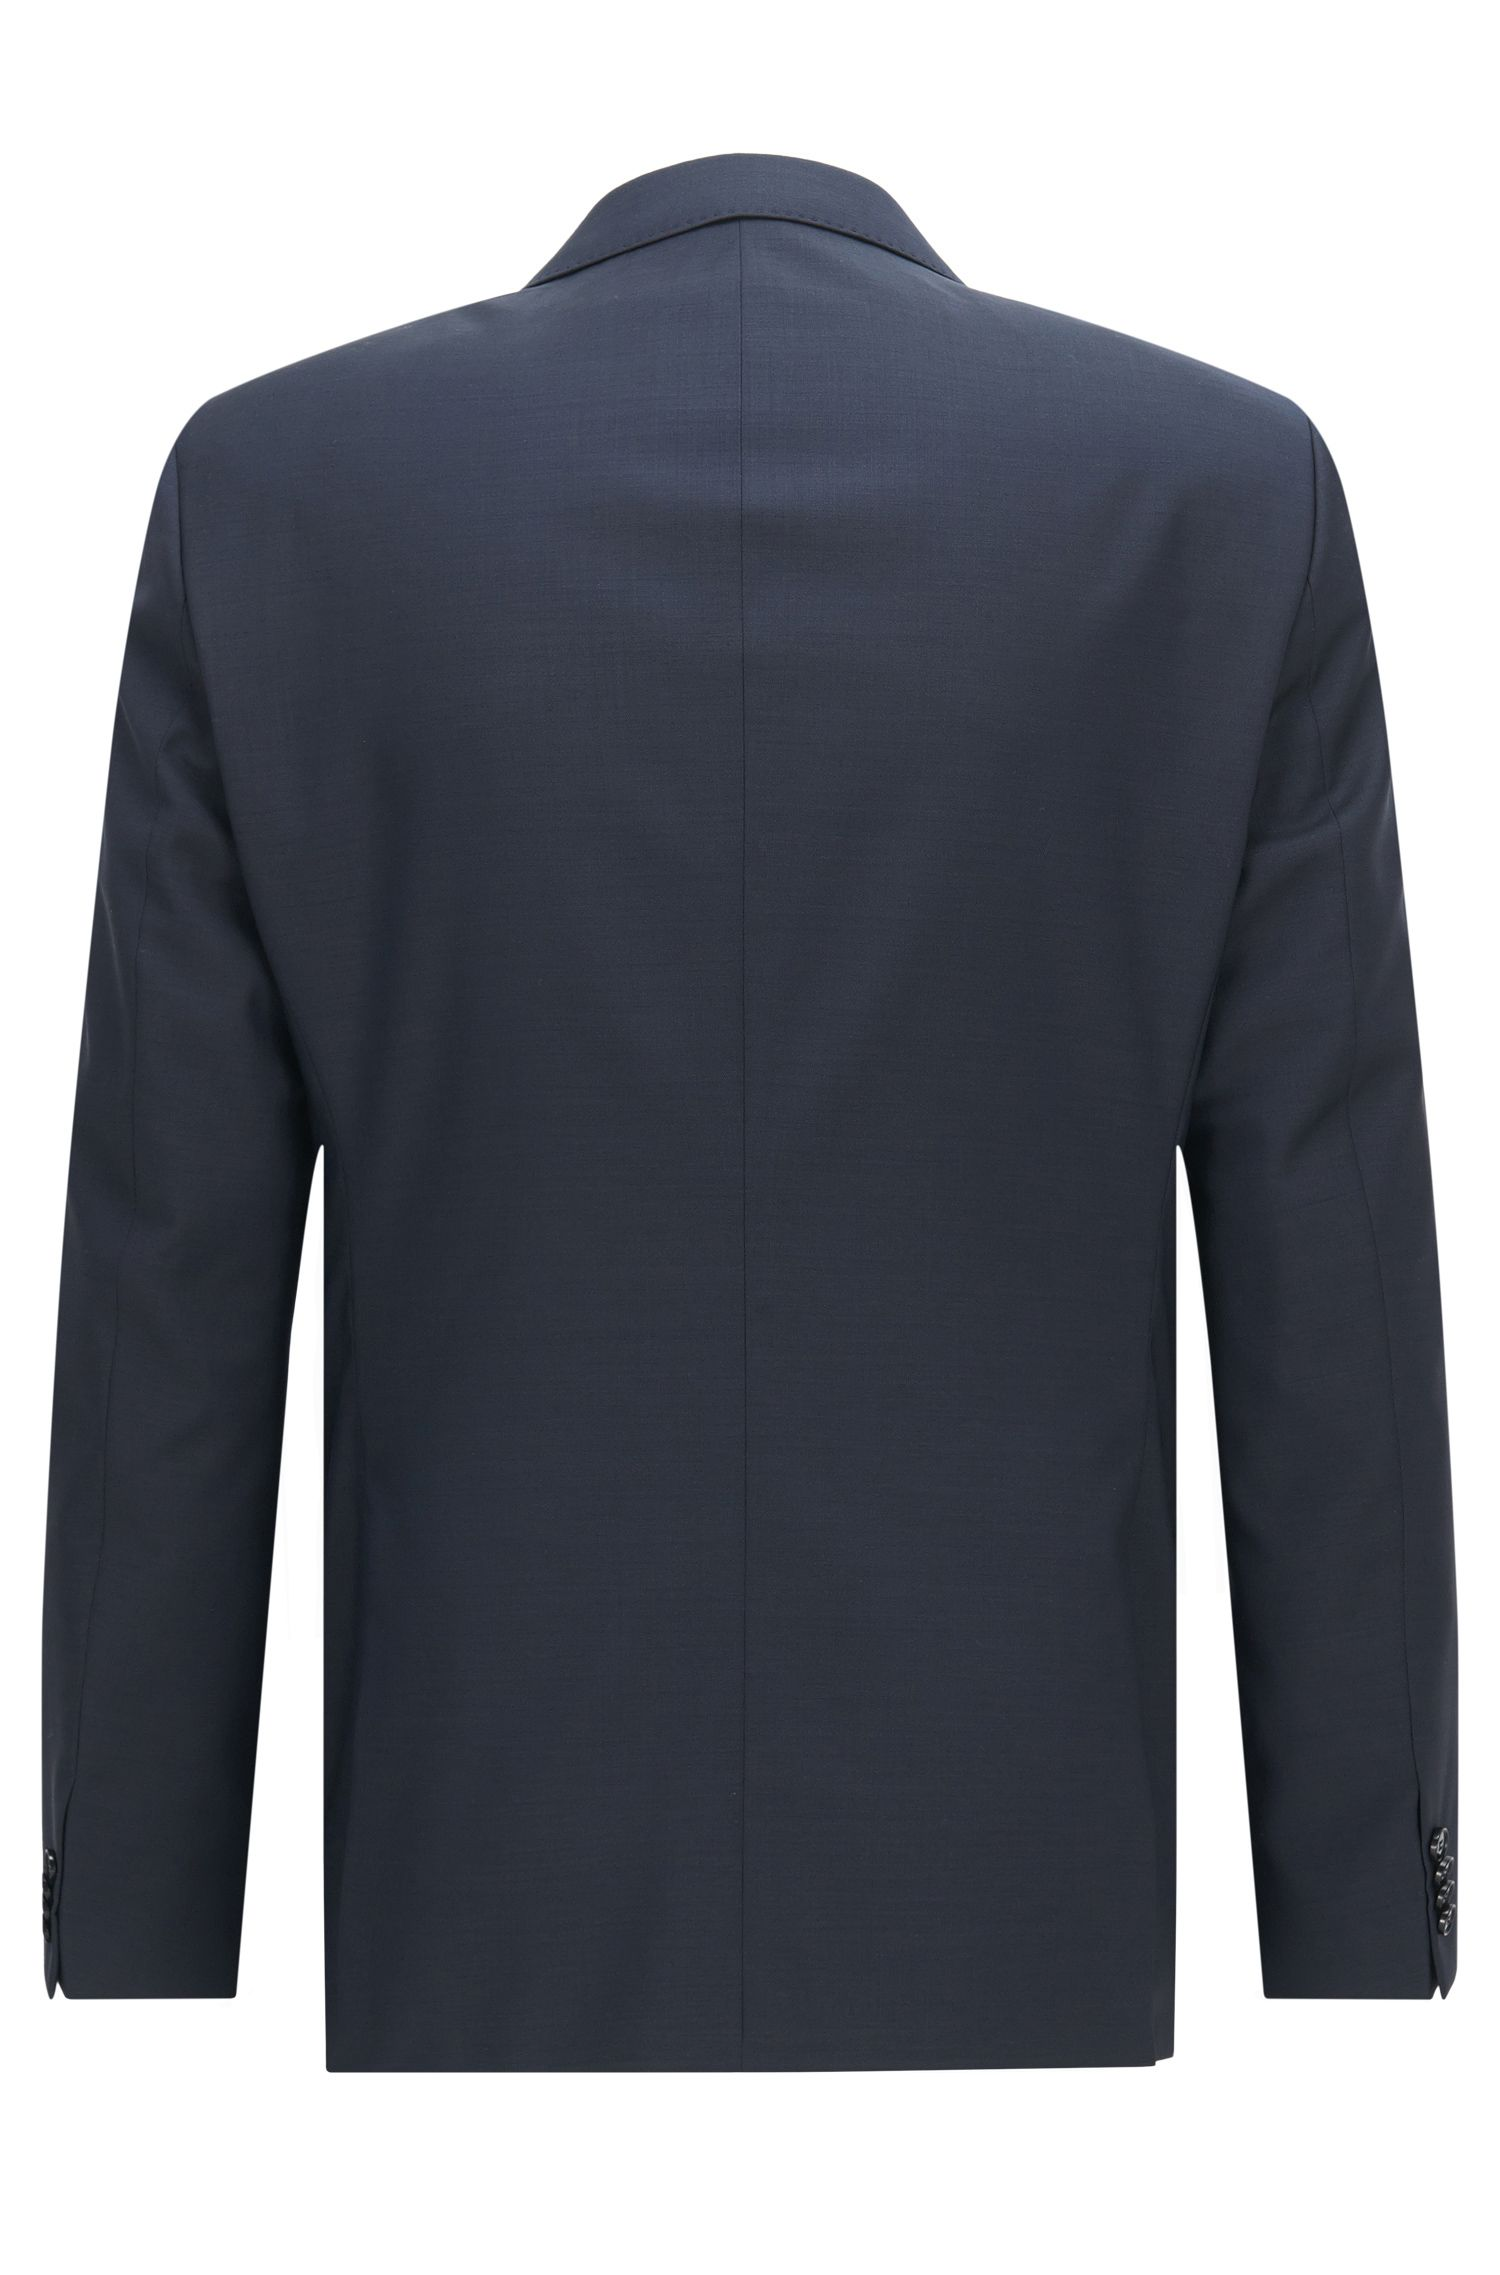 Unifarbenes Slim-Fit Sakko aus Schurwolle: 'C-Huge1S'